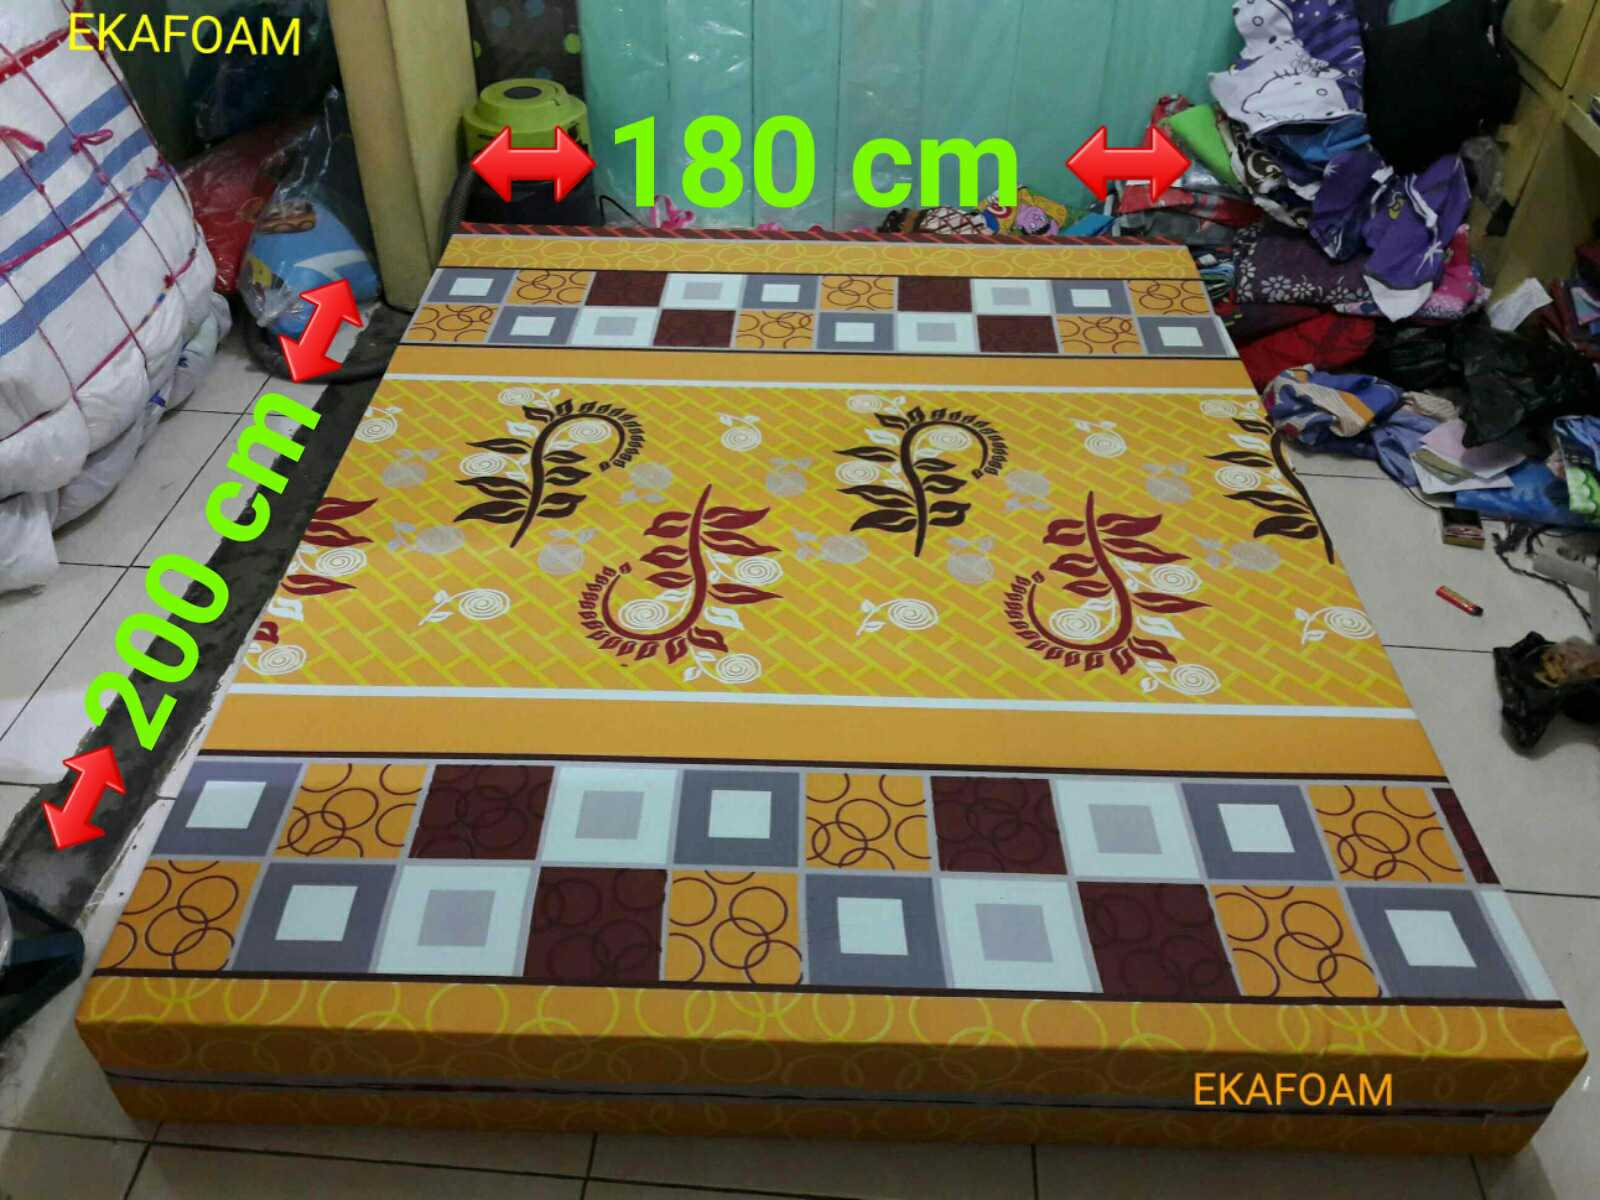 Harga Kasur Inoac Sofa Bed Inoac Terbaru 19 Januari 2017